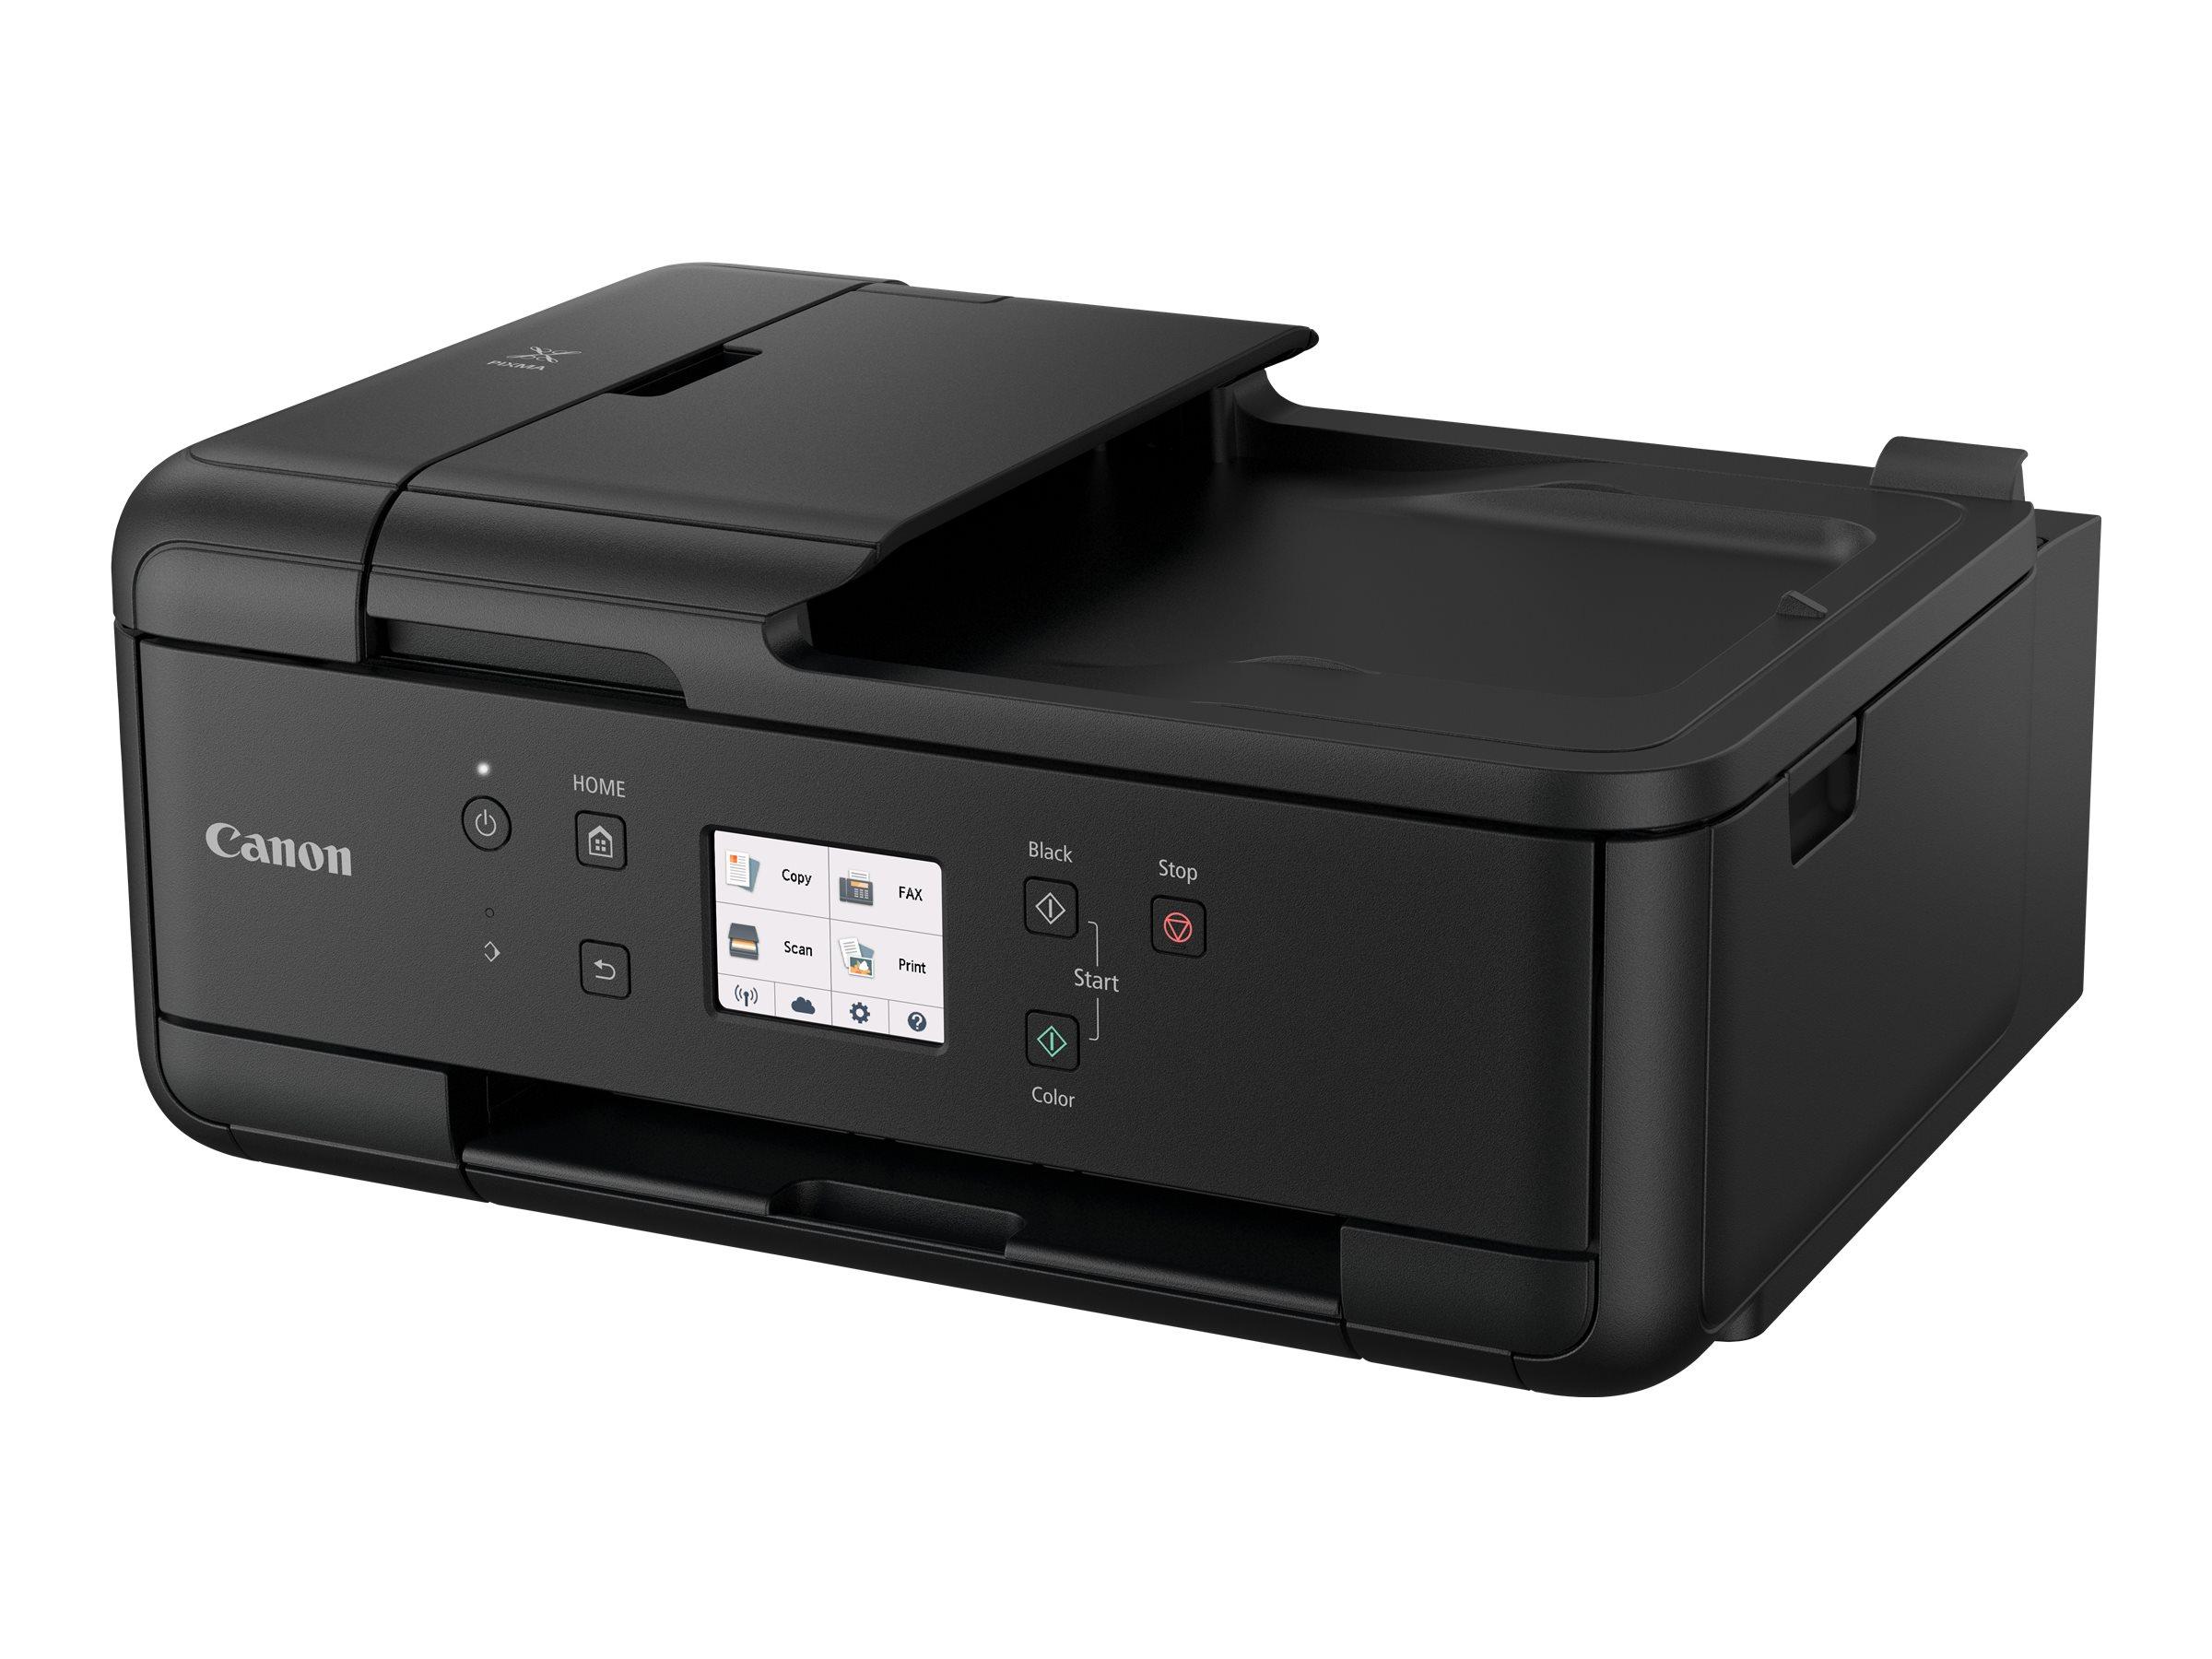 Canon PIXMA TR7550 - Multifunktionsdrucker - Farbe - Tintenstrahl - A4 (210 x 297 mm)